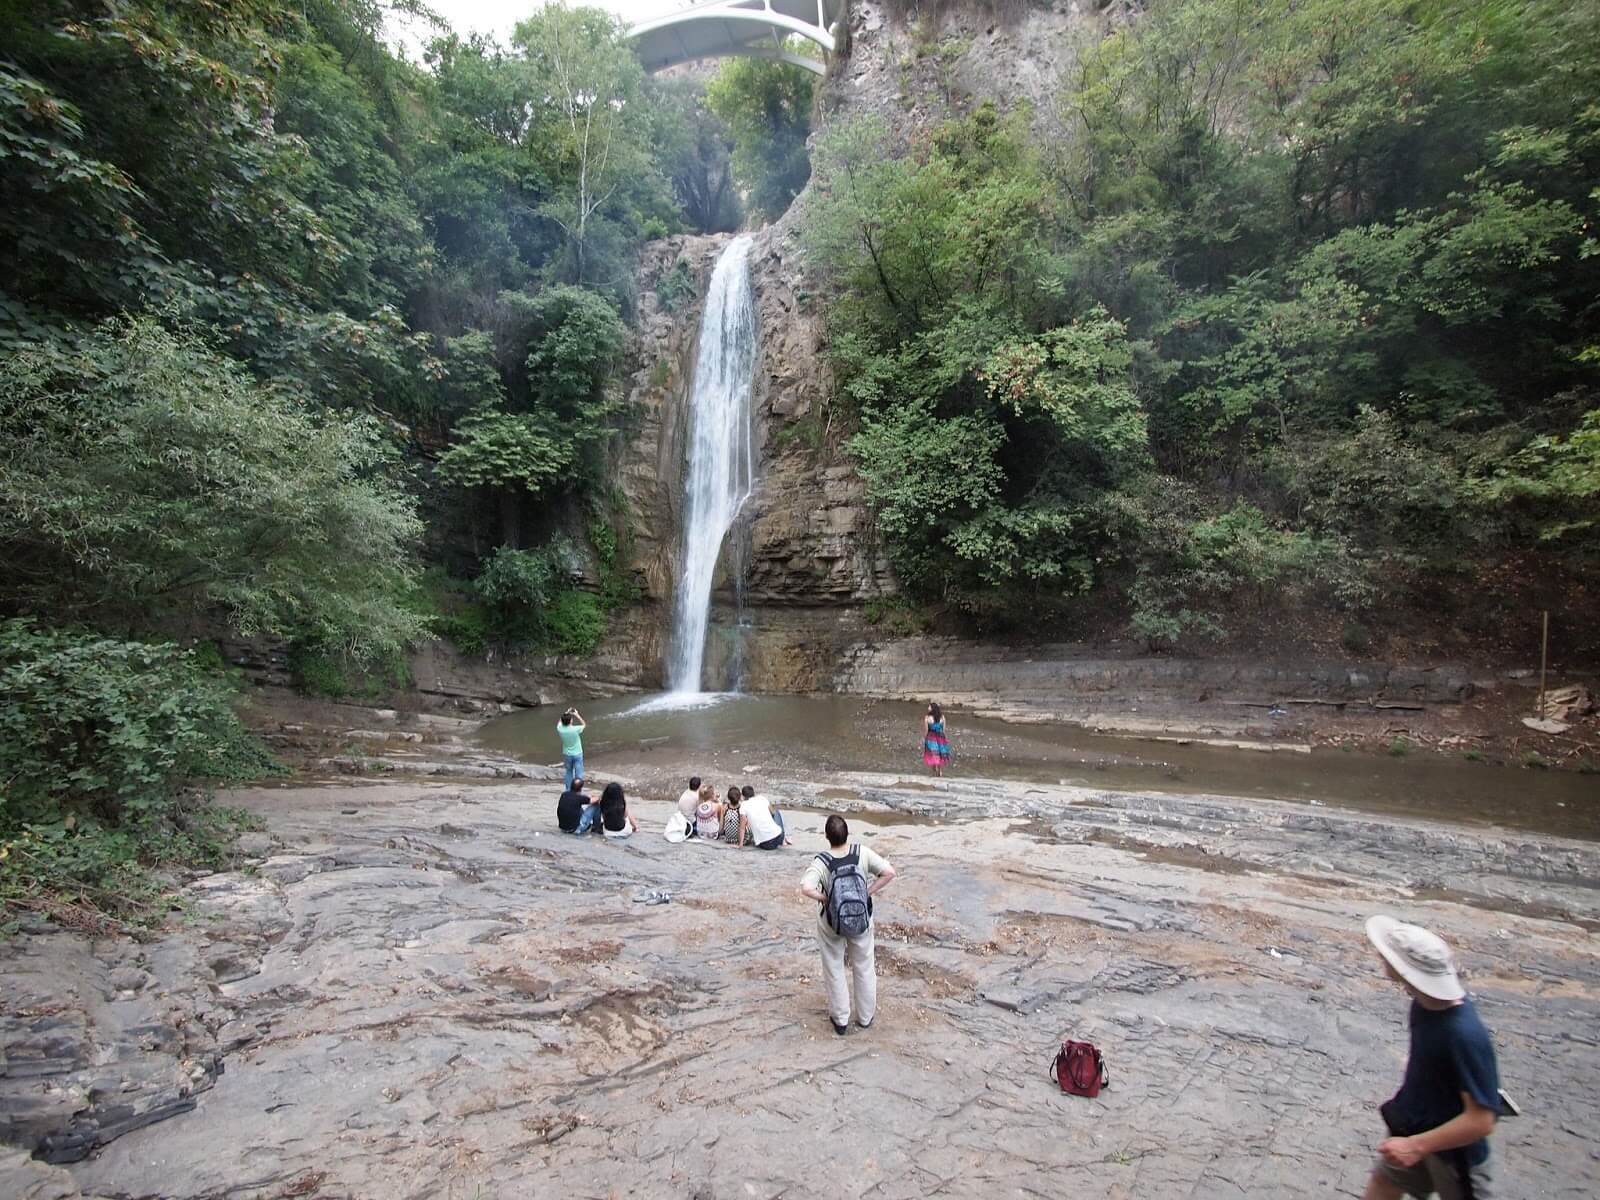 Waterfall in National Botanical Garden of Georgia